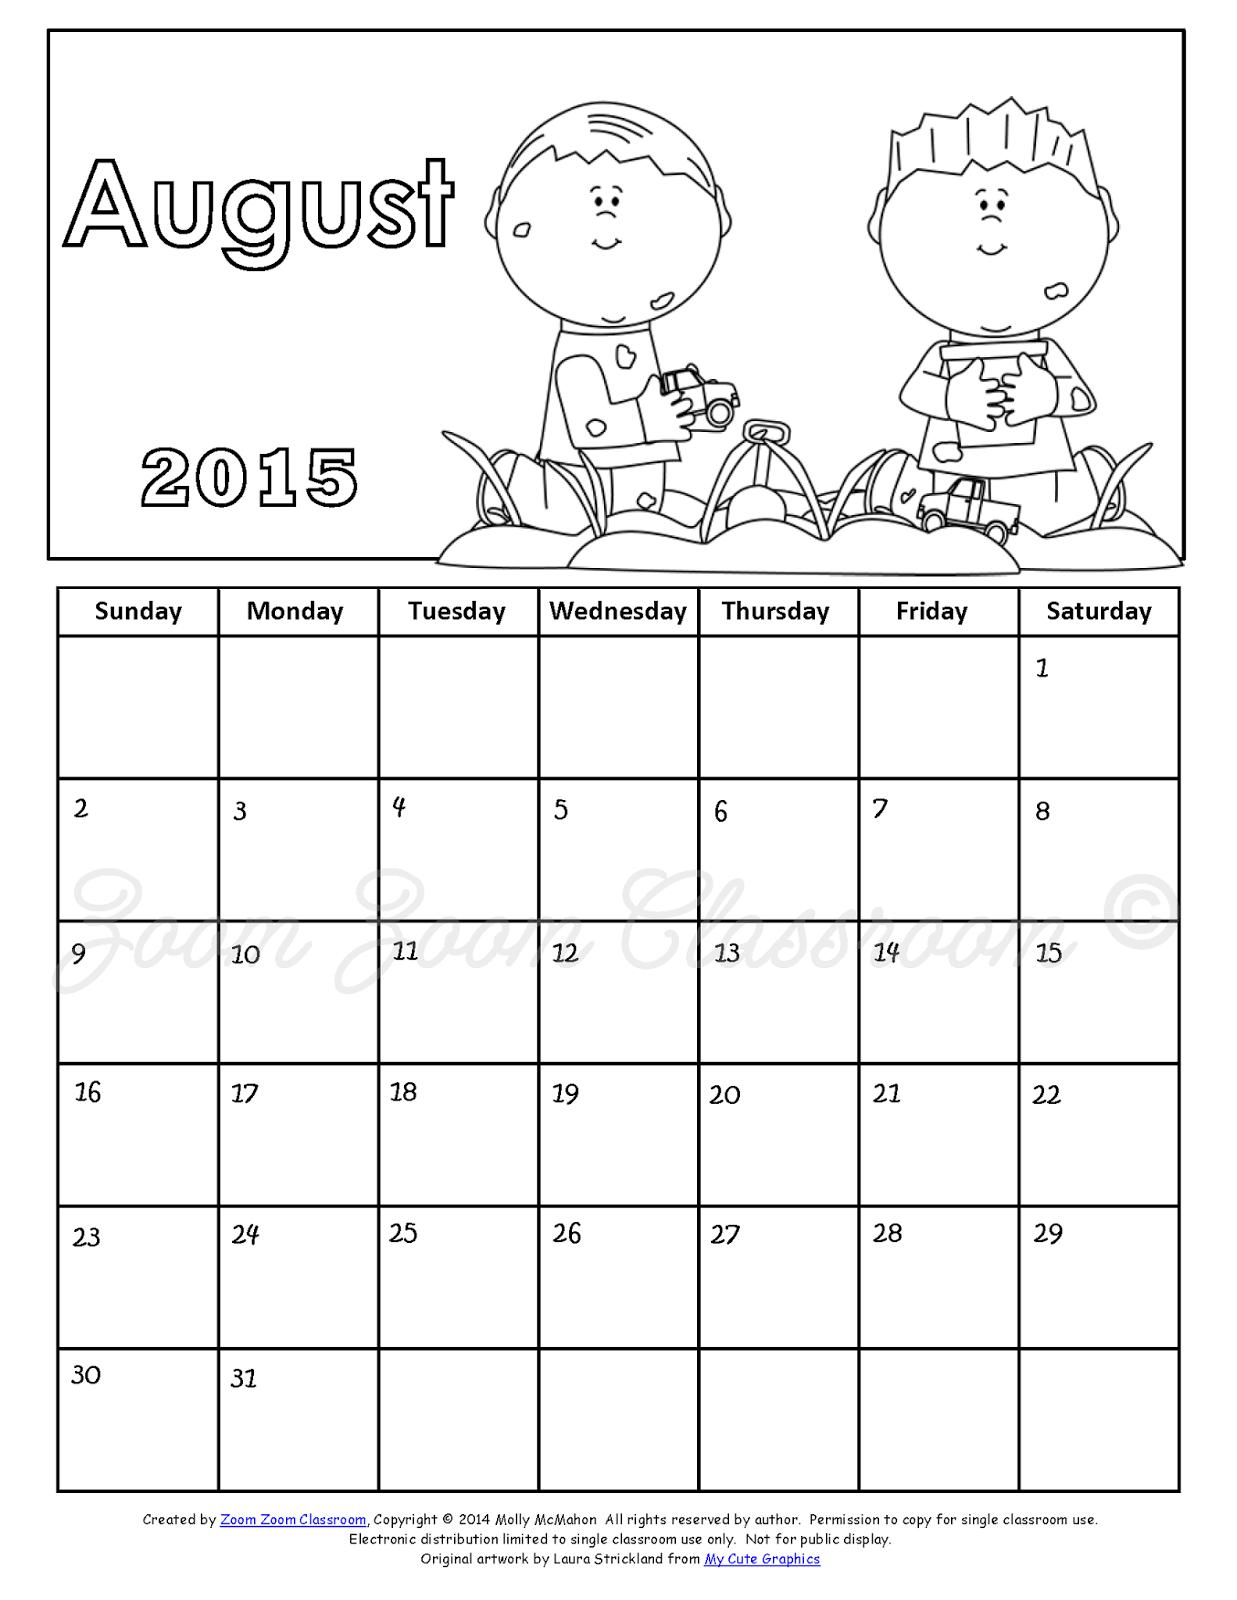 august 2015 blank calendar